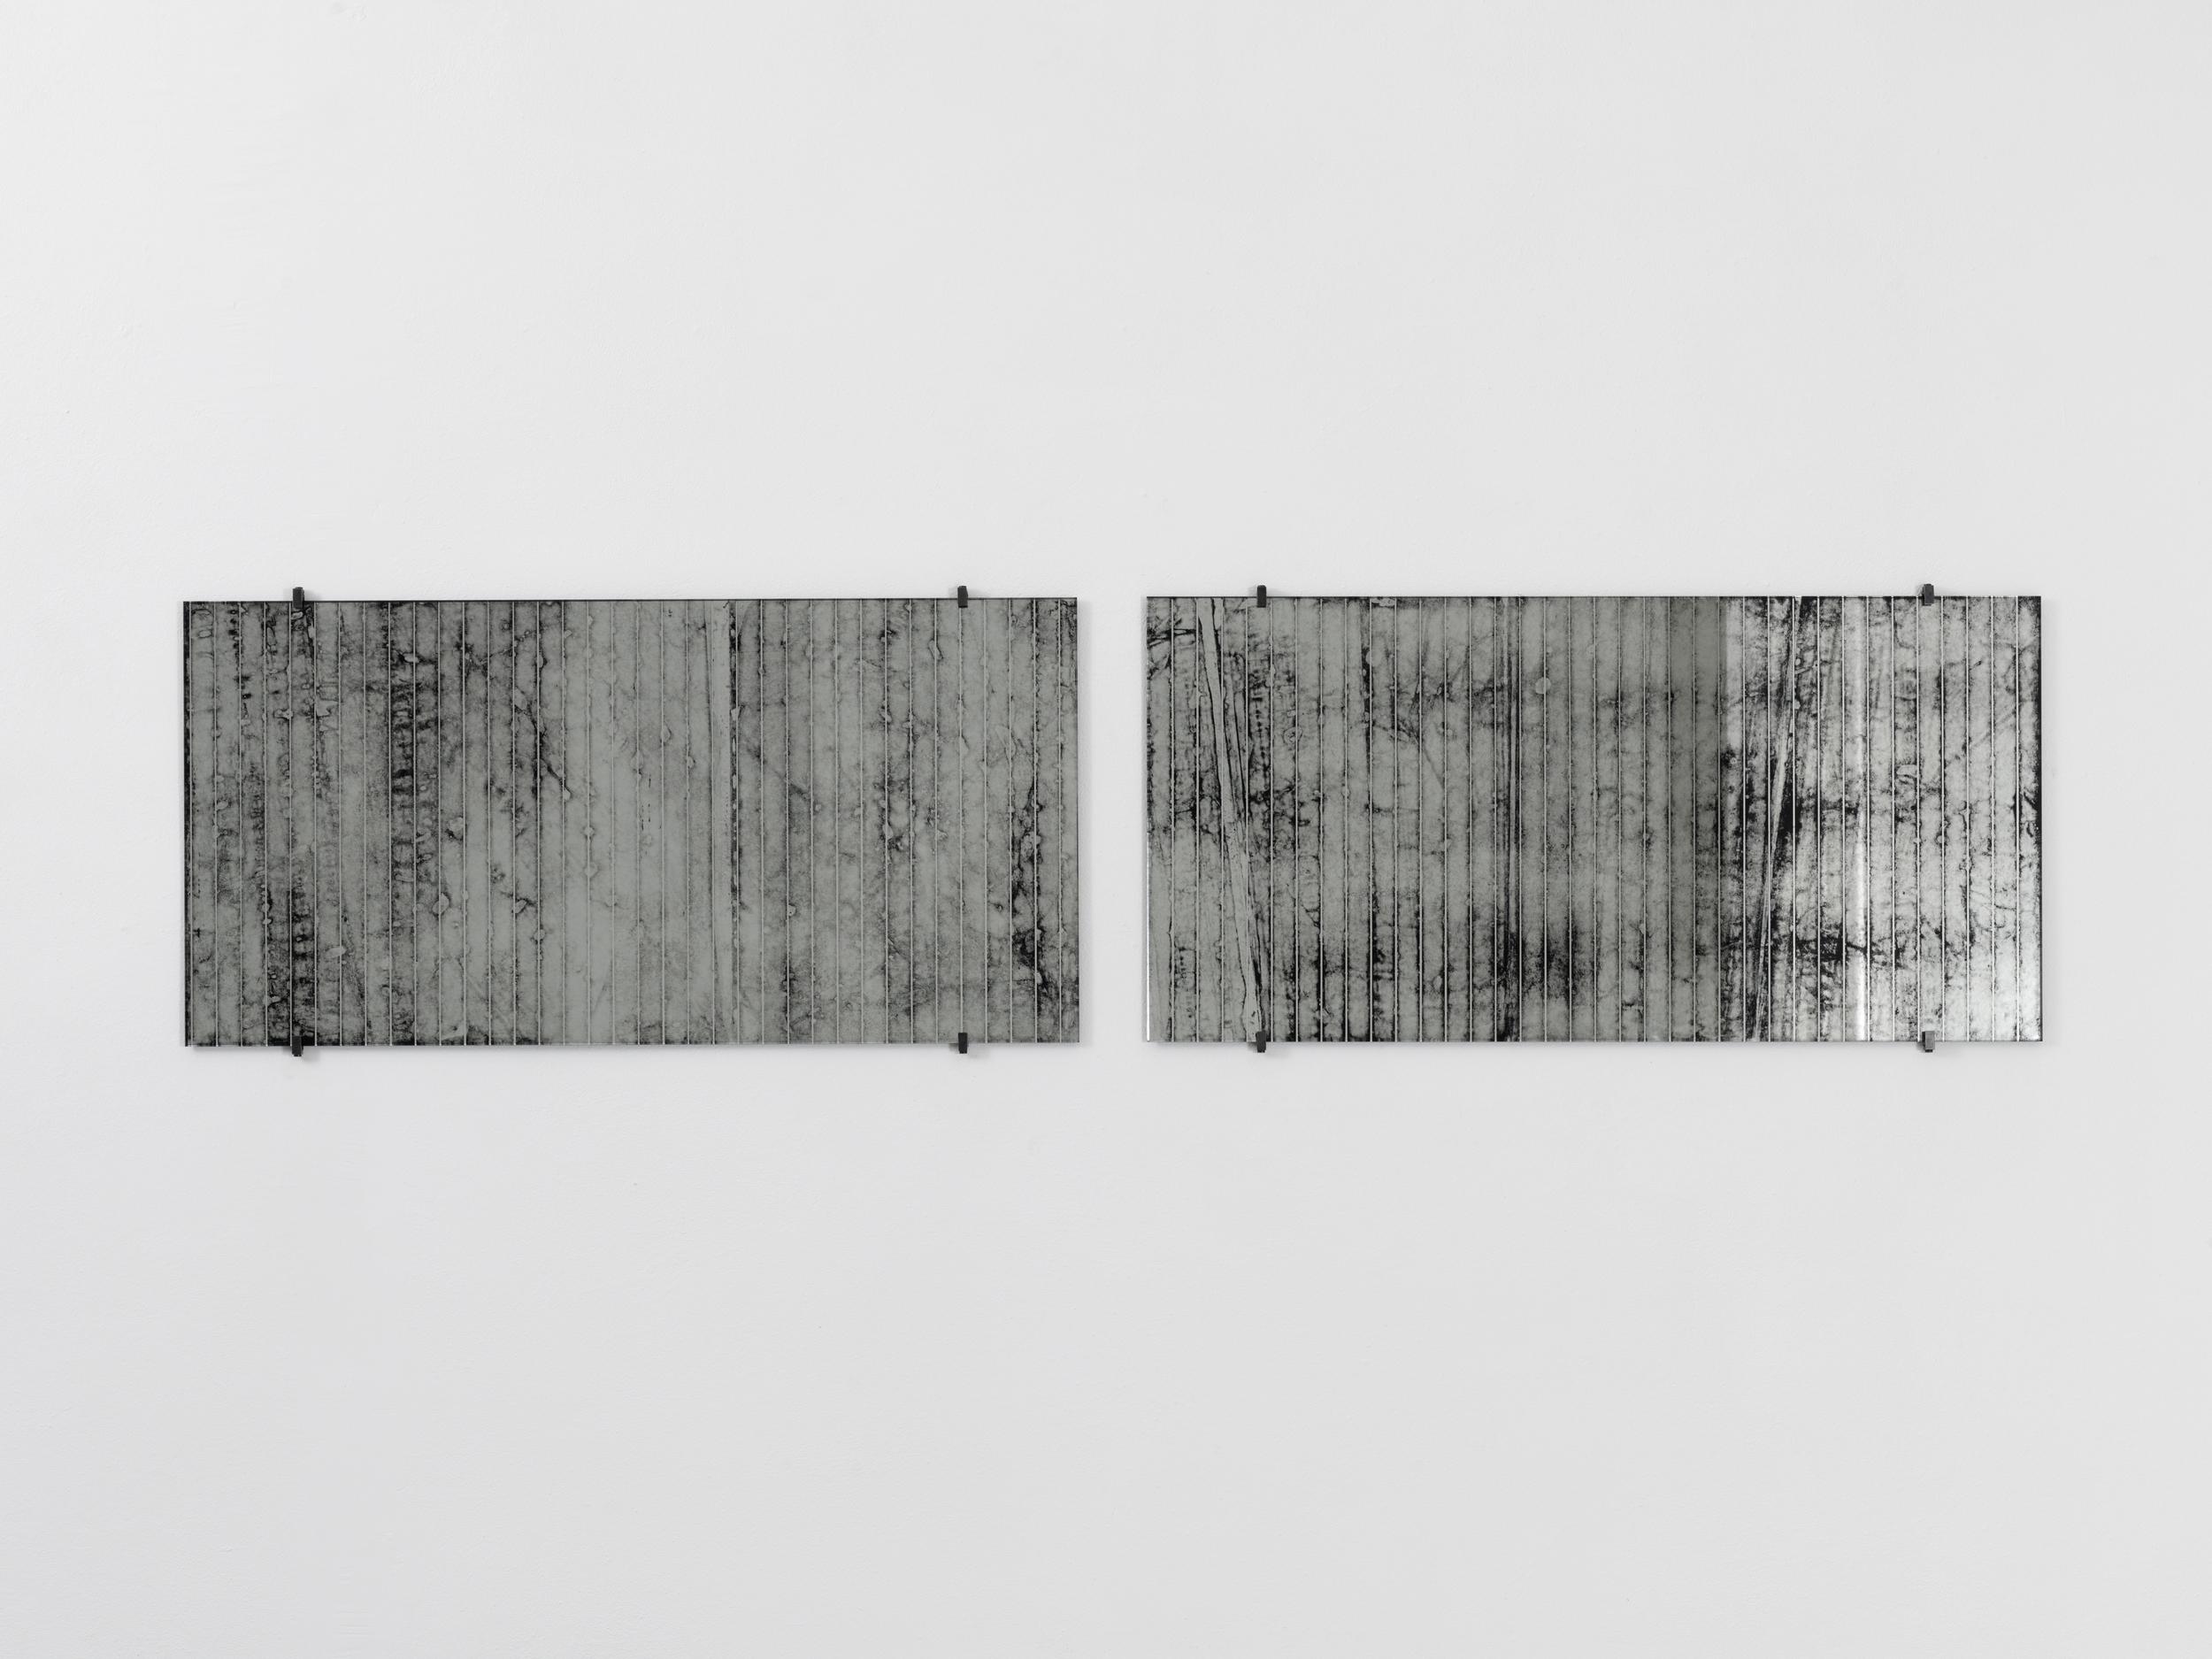 ribordy contemporary, Geneva - Davina Semo - 2014